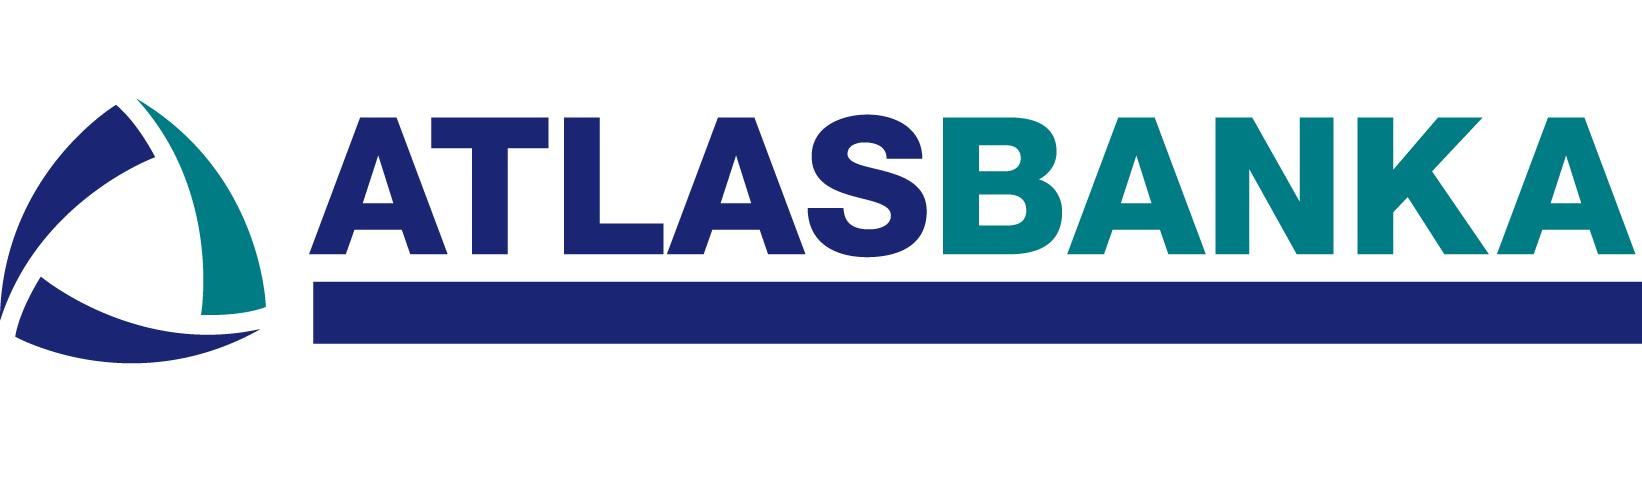 Atlas Banka Logo photo - 1